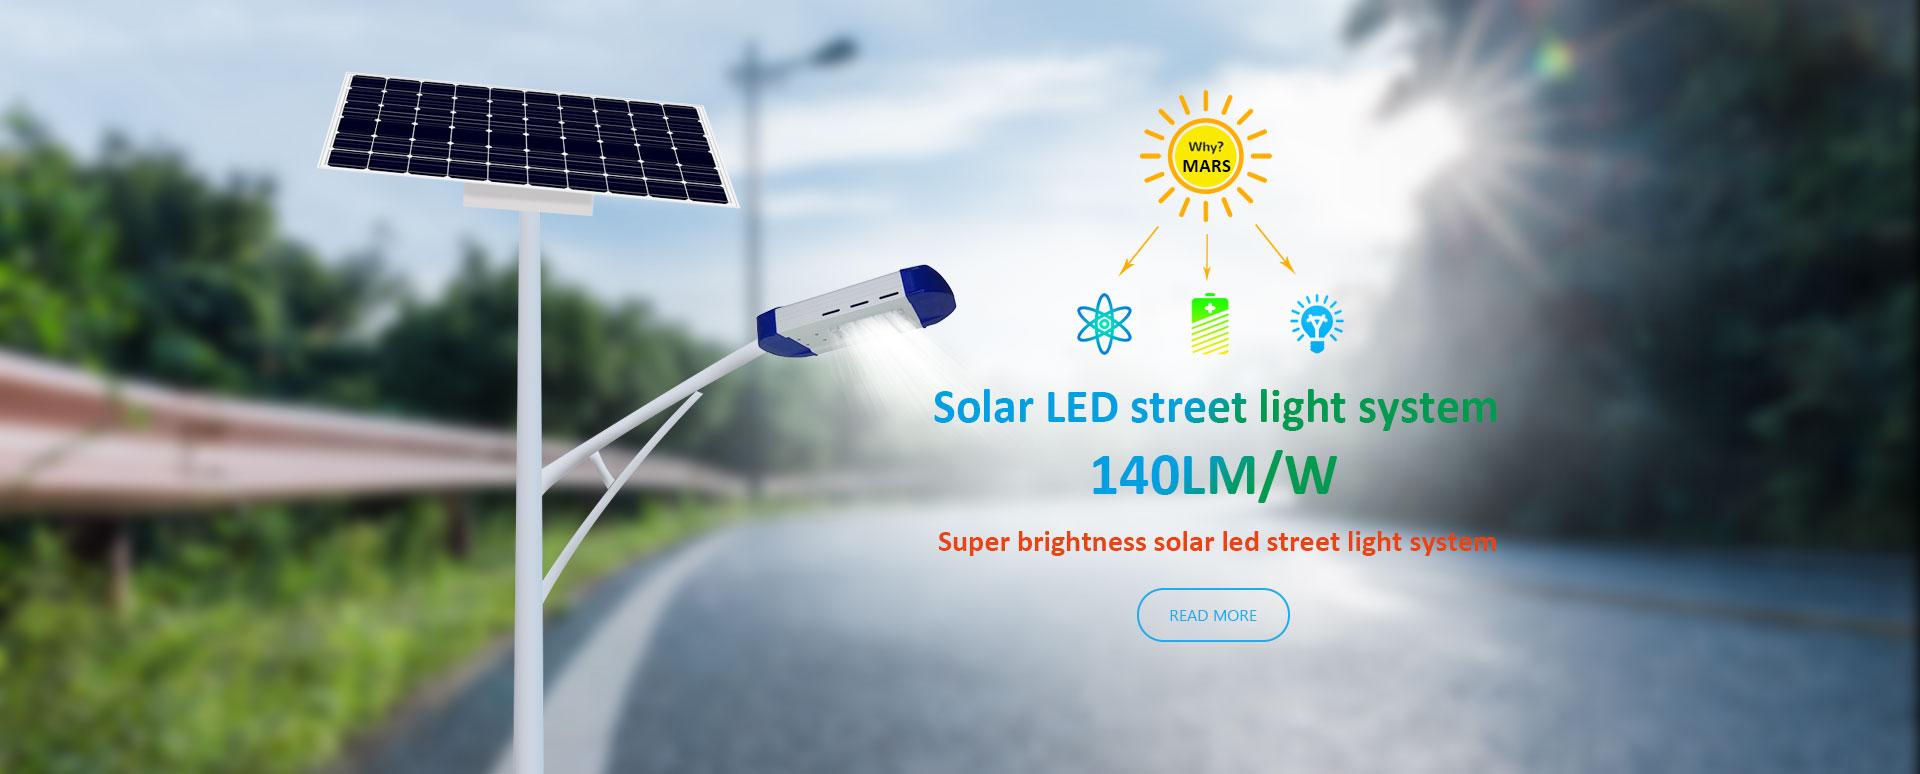 50W Super Bright Led Solar Street Light Price List